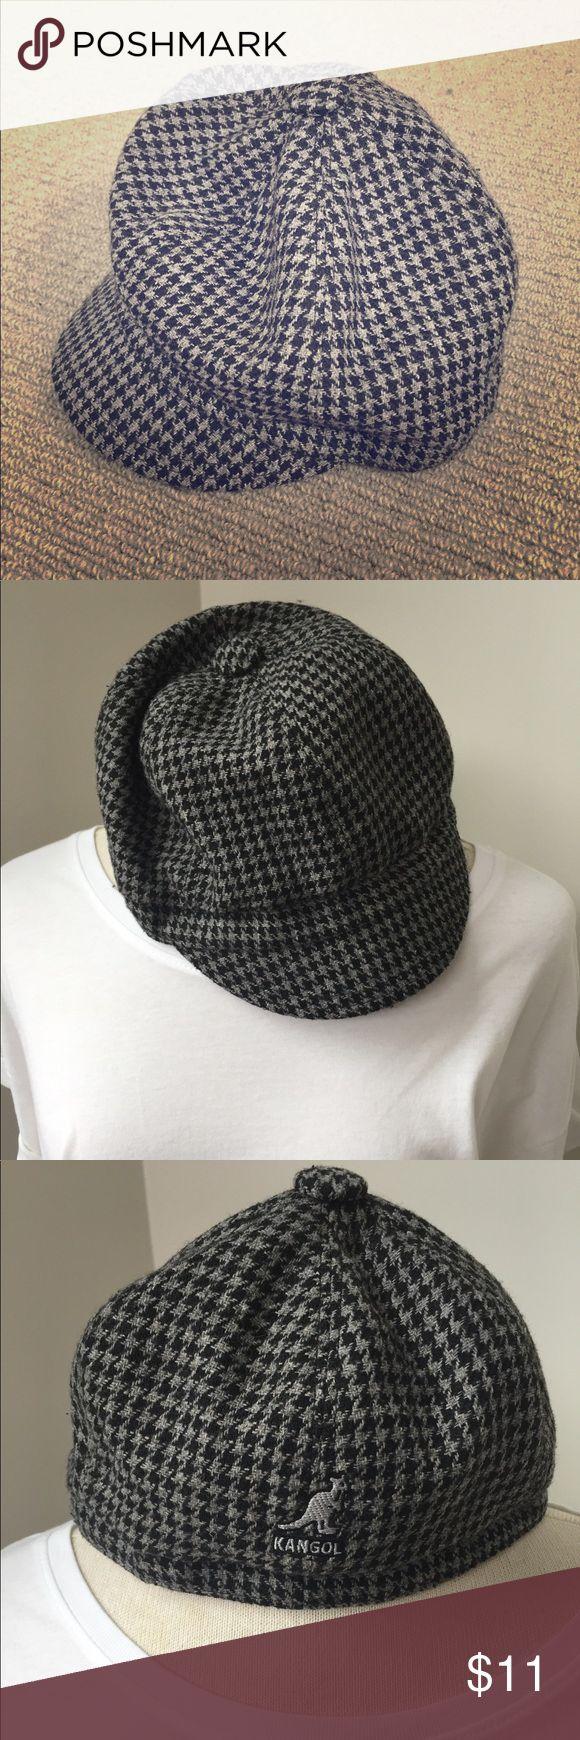 Kangol News Girl Tweed Cap Like-new girls tweed cap. Super hip. Kangol Accessories Hats